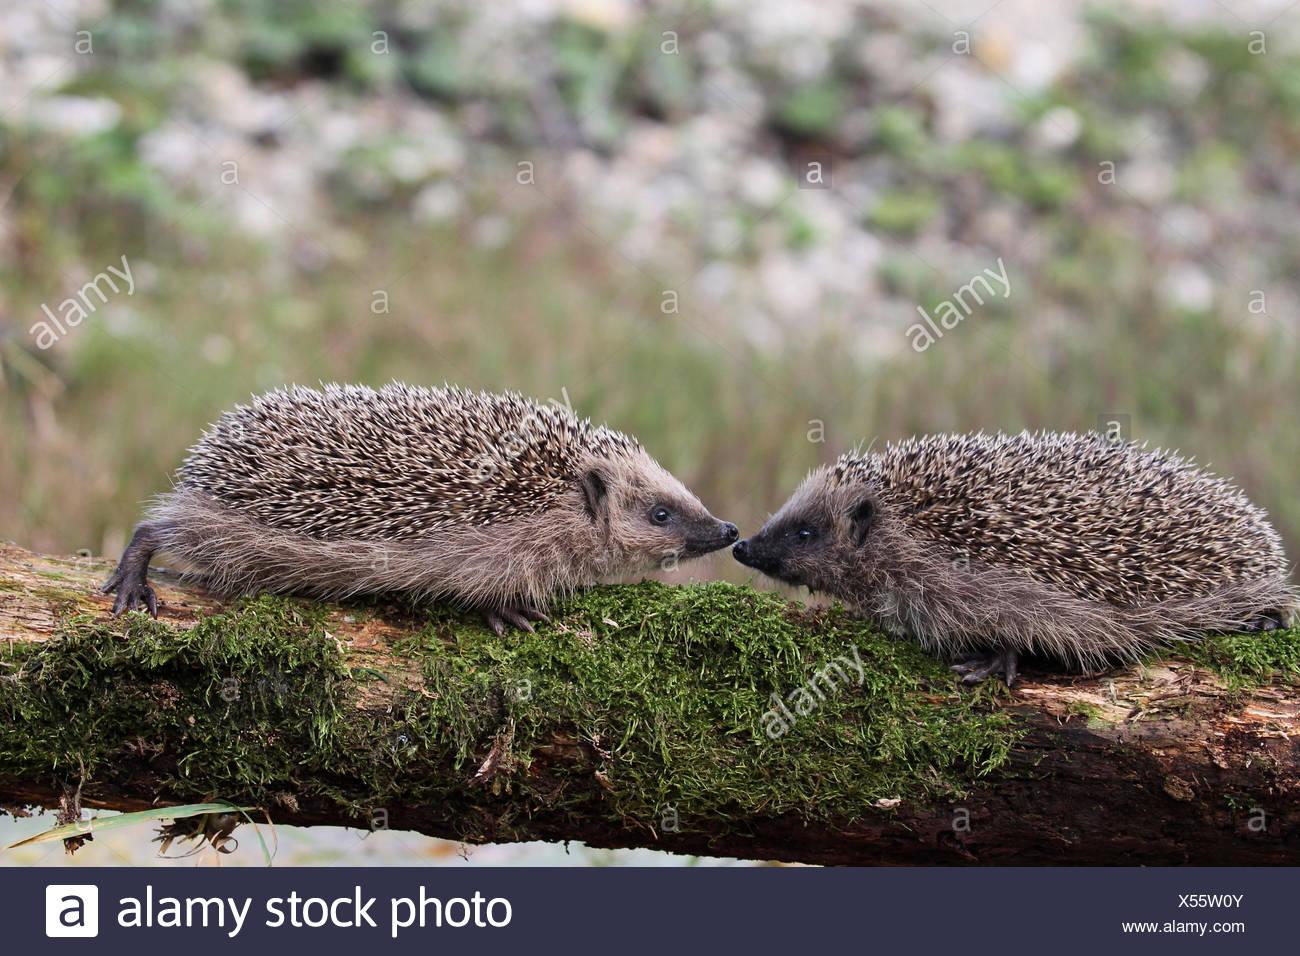 European Hedgehogs (Erinaceus europaeus), young, 7-8 weeks, Allgäu, Bavaria, Germany - Stock Image